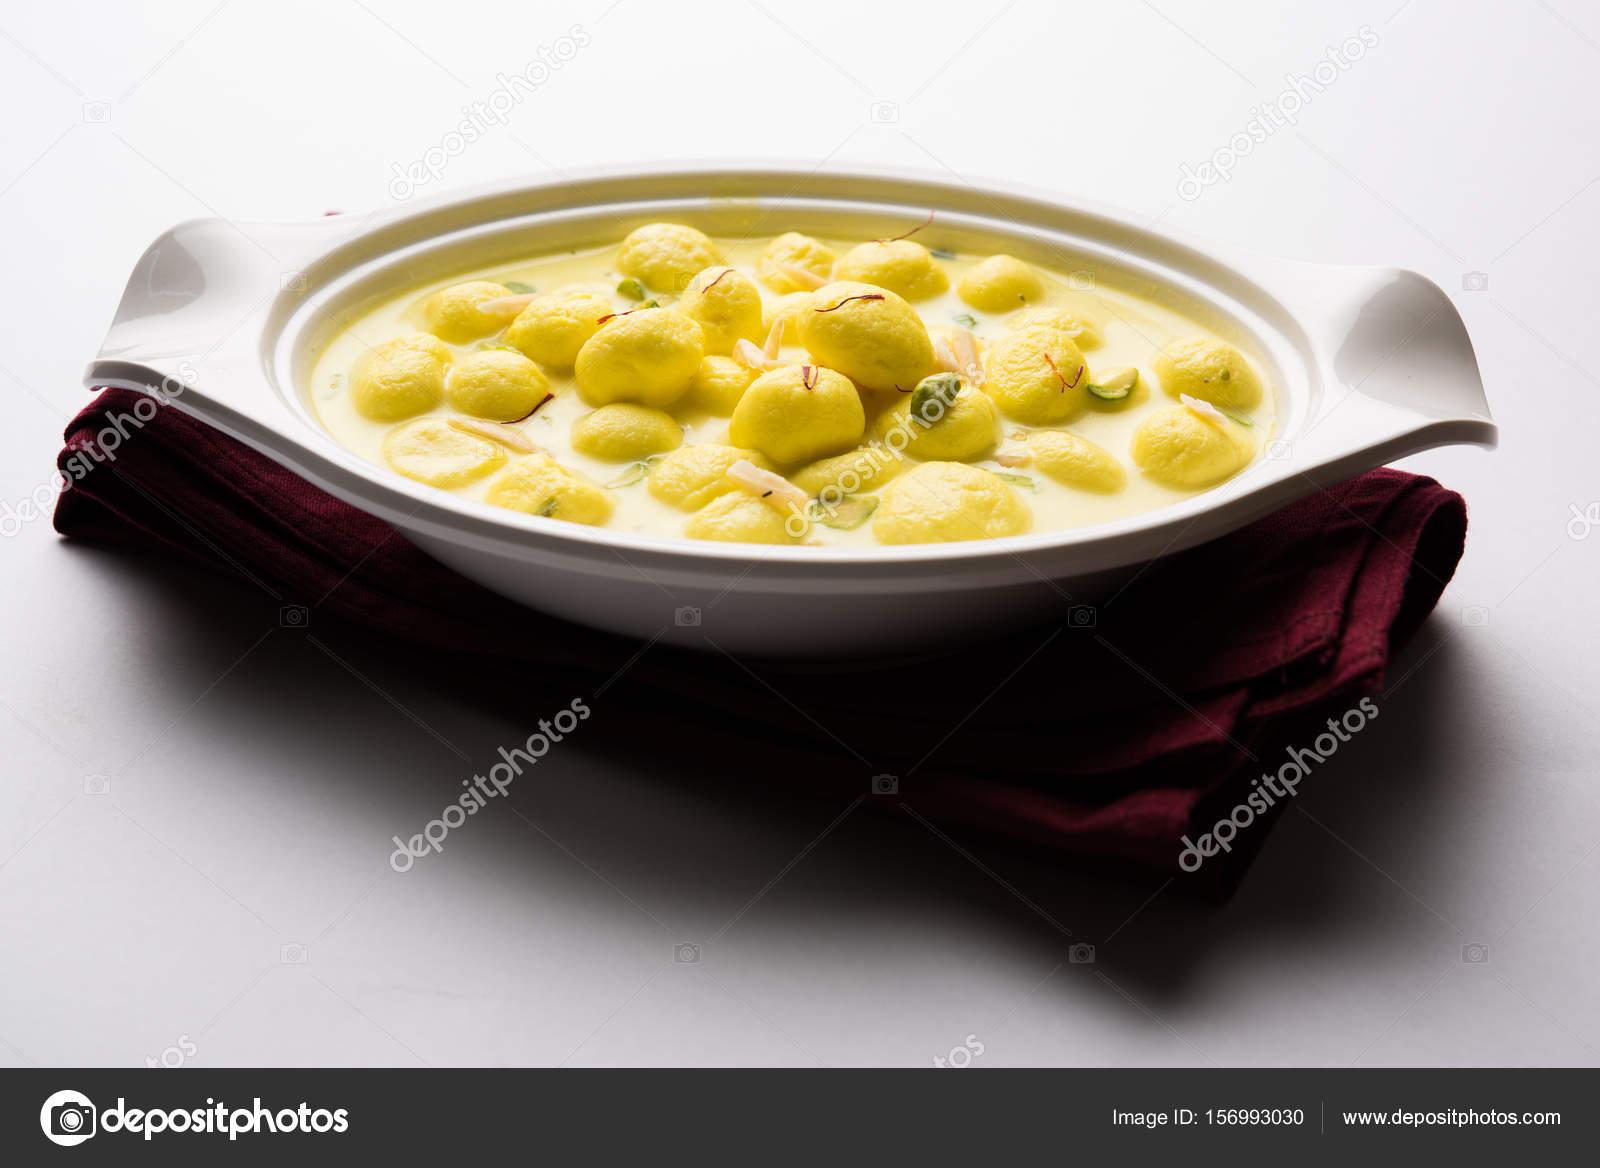 Télécharger un extrait angoori rasmalai ou anguri ras malai est un.